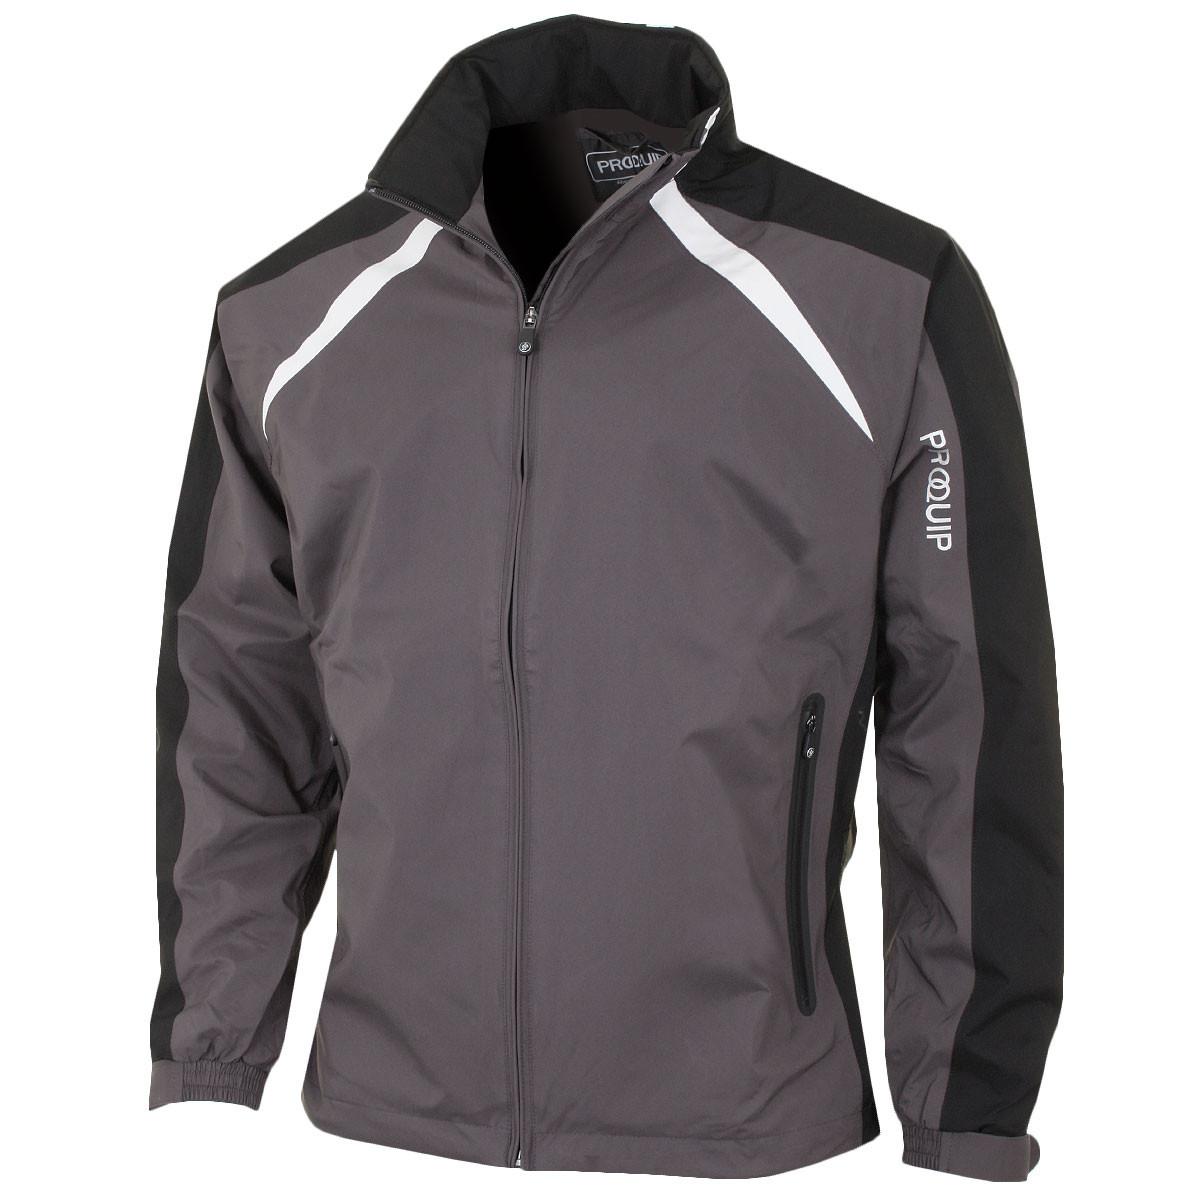 862307a8 Proquip Golf Mens Trophy Waterproof Full Zip Ryder Cup Jacket ...